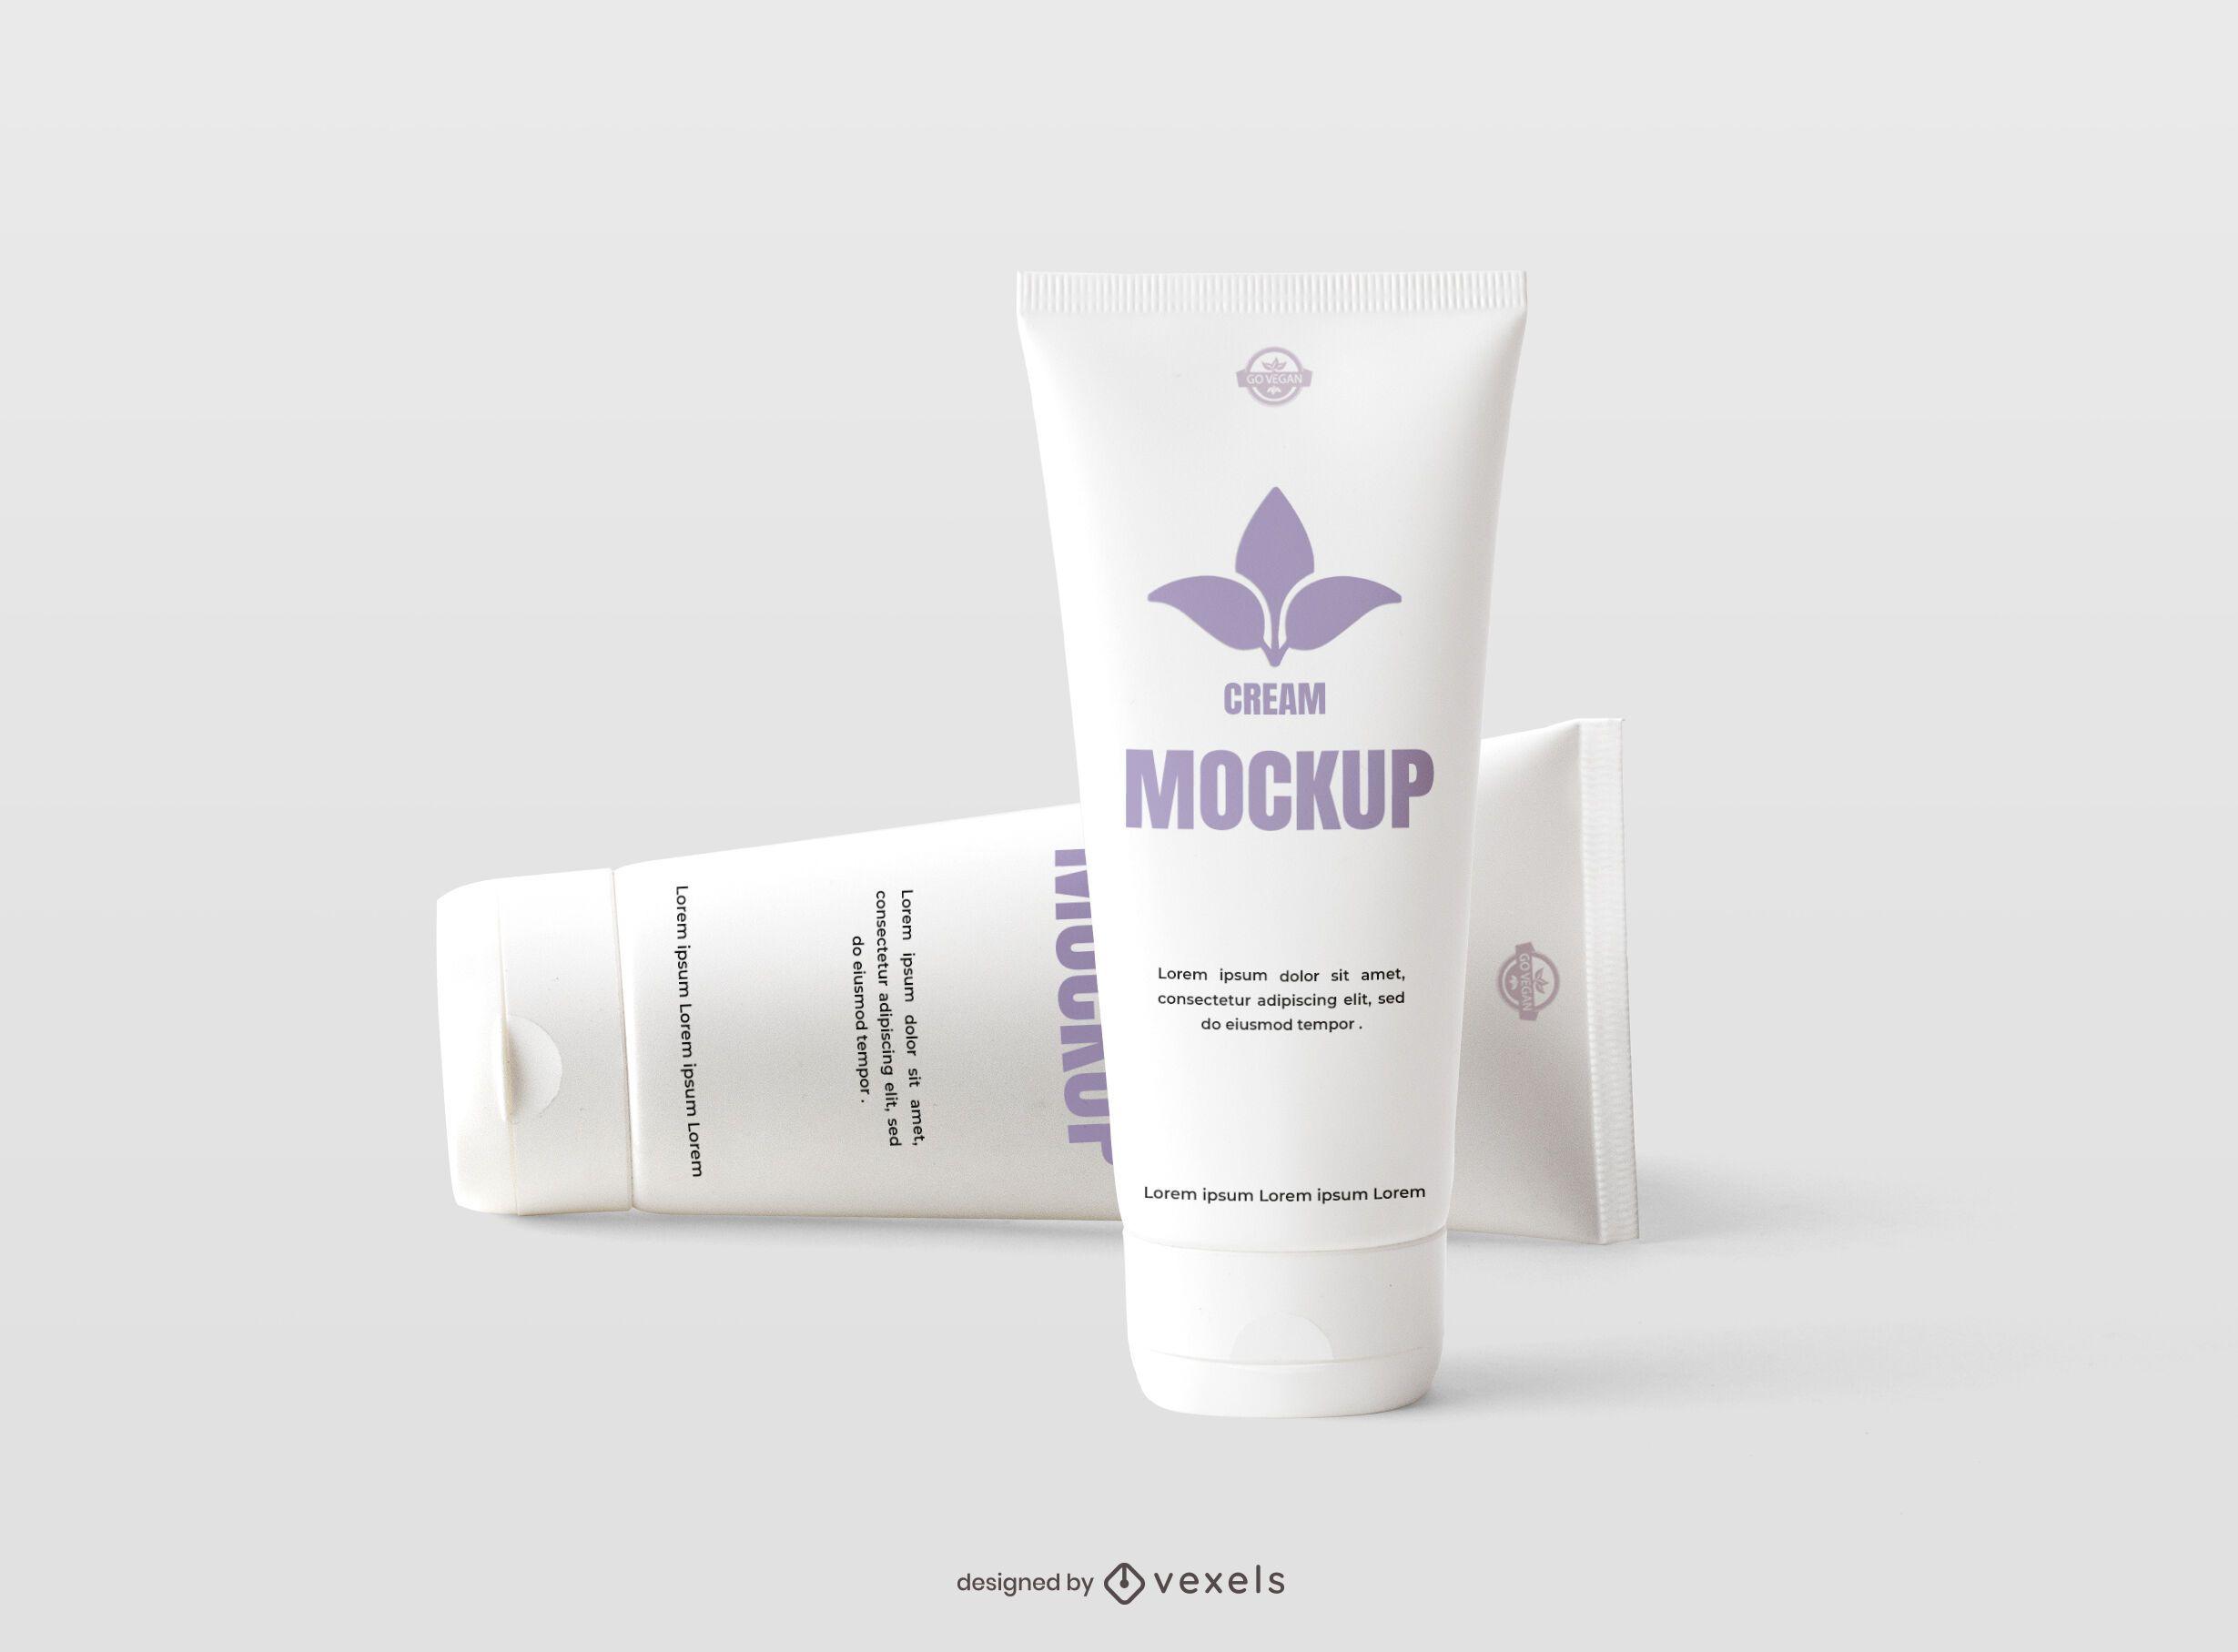 Tube cream mockup design set